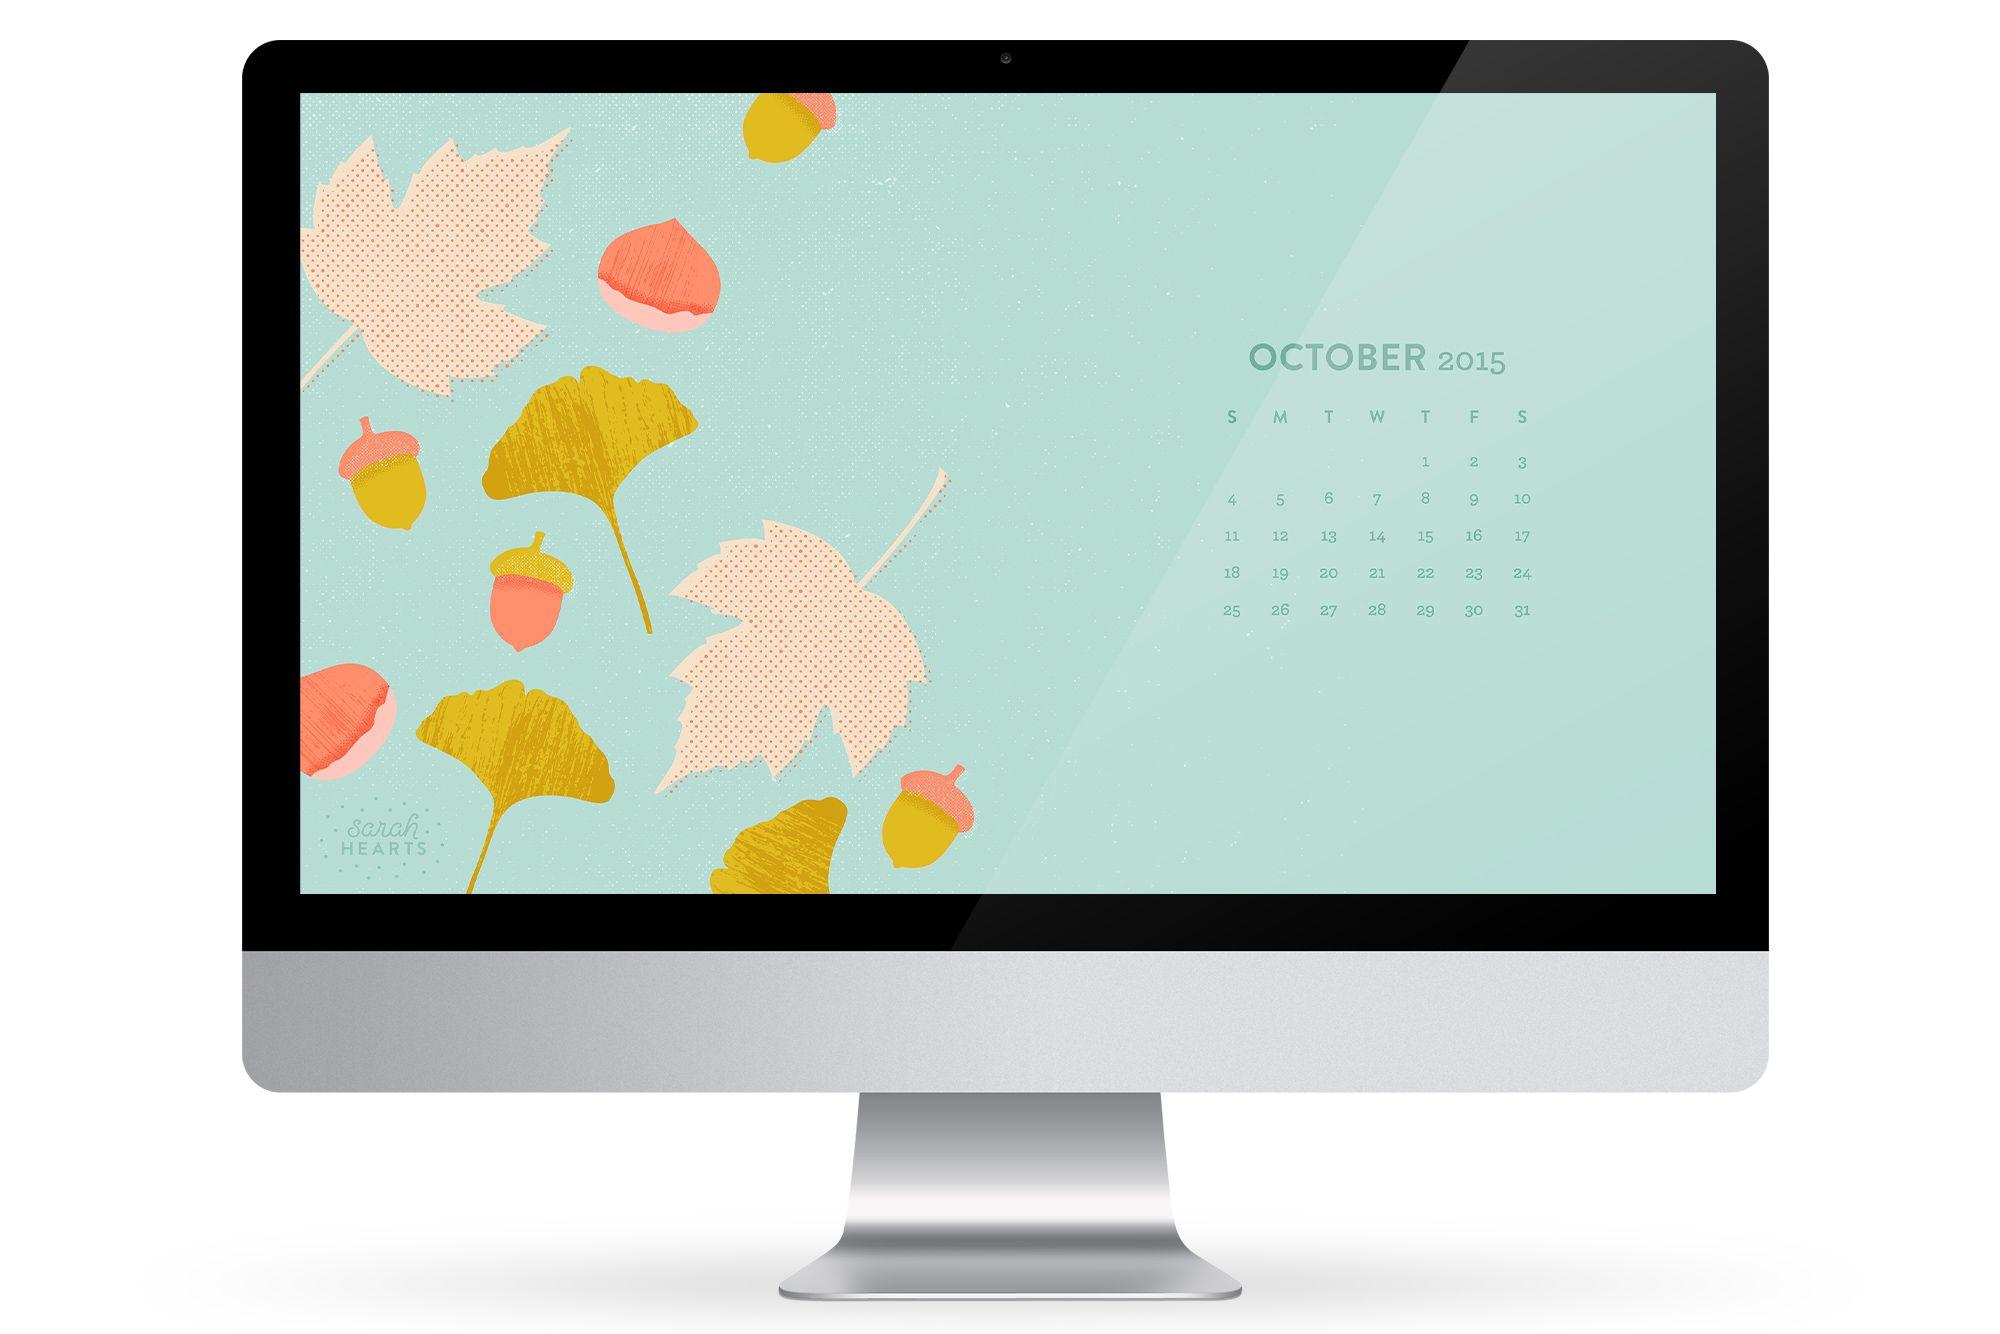 october 2015 calendar wallpaper